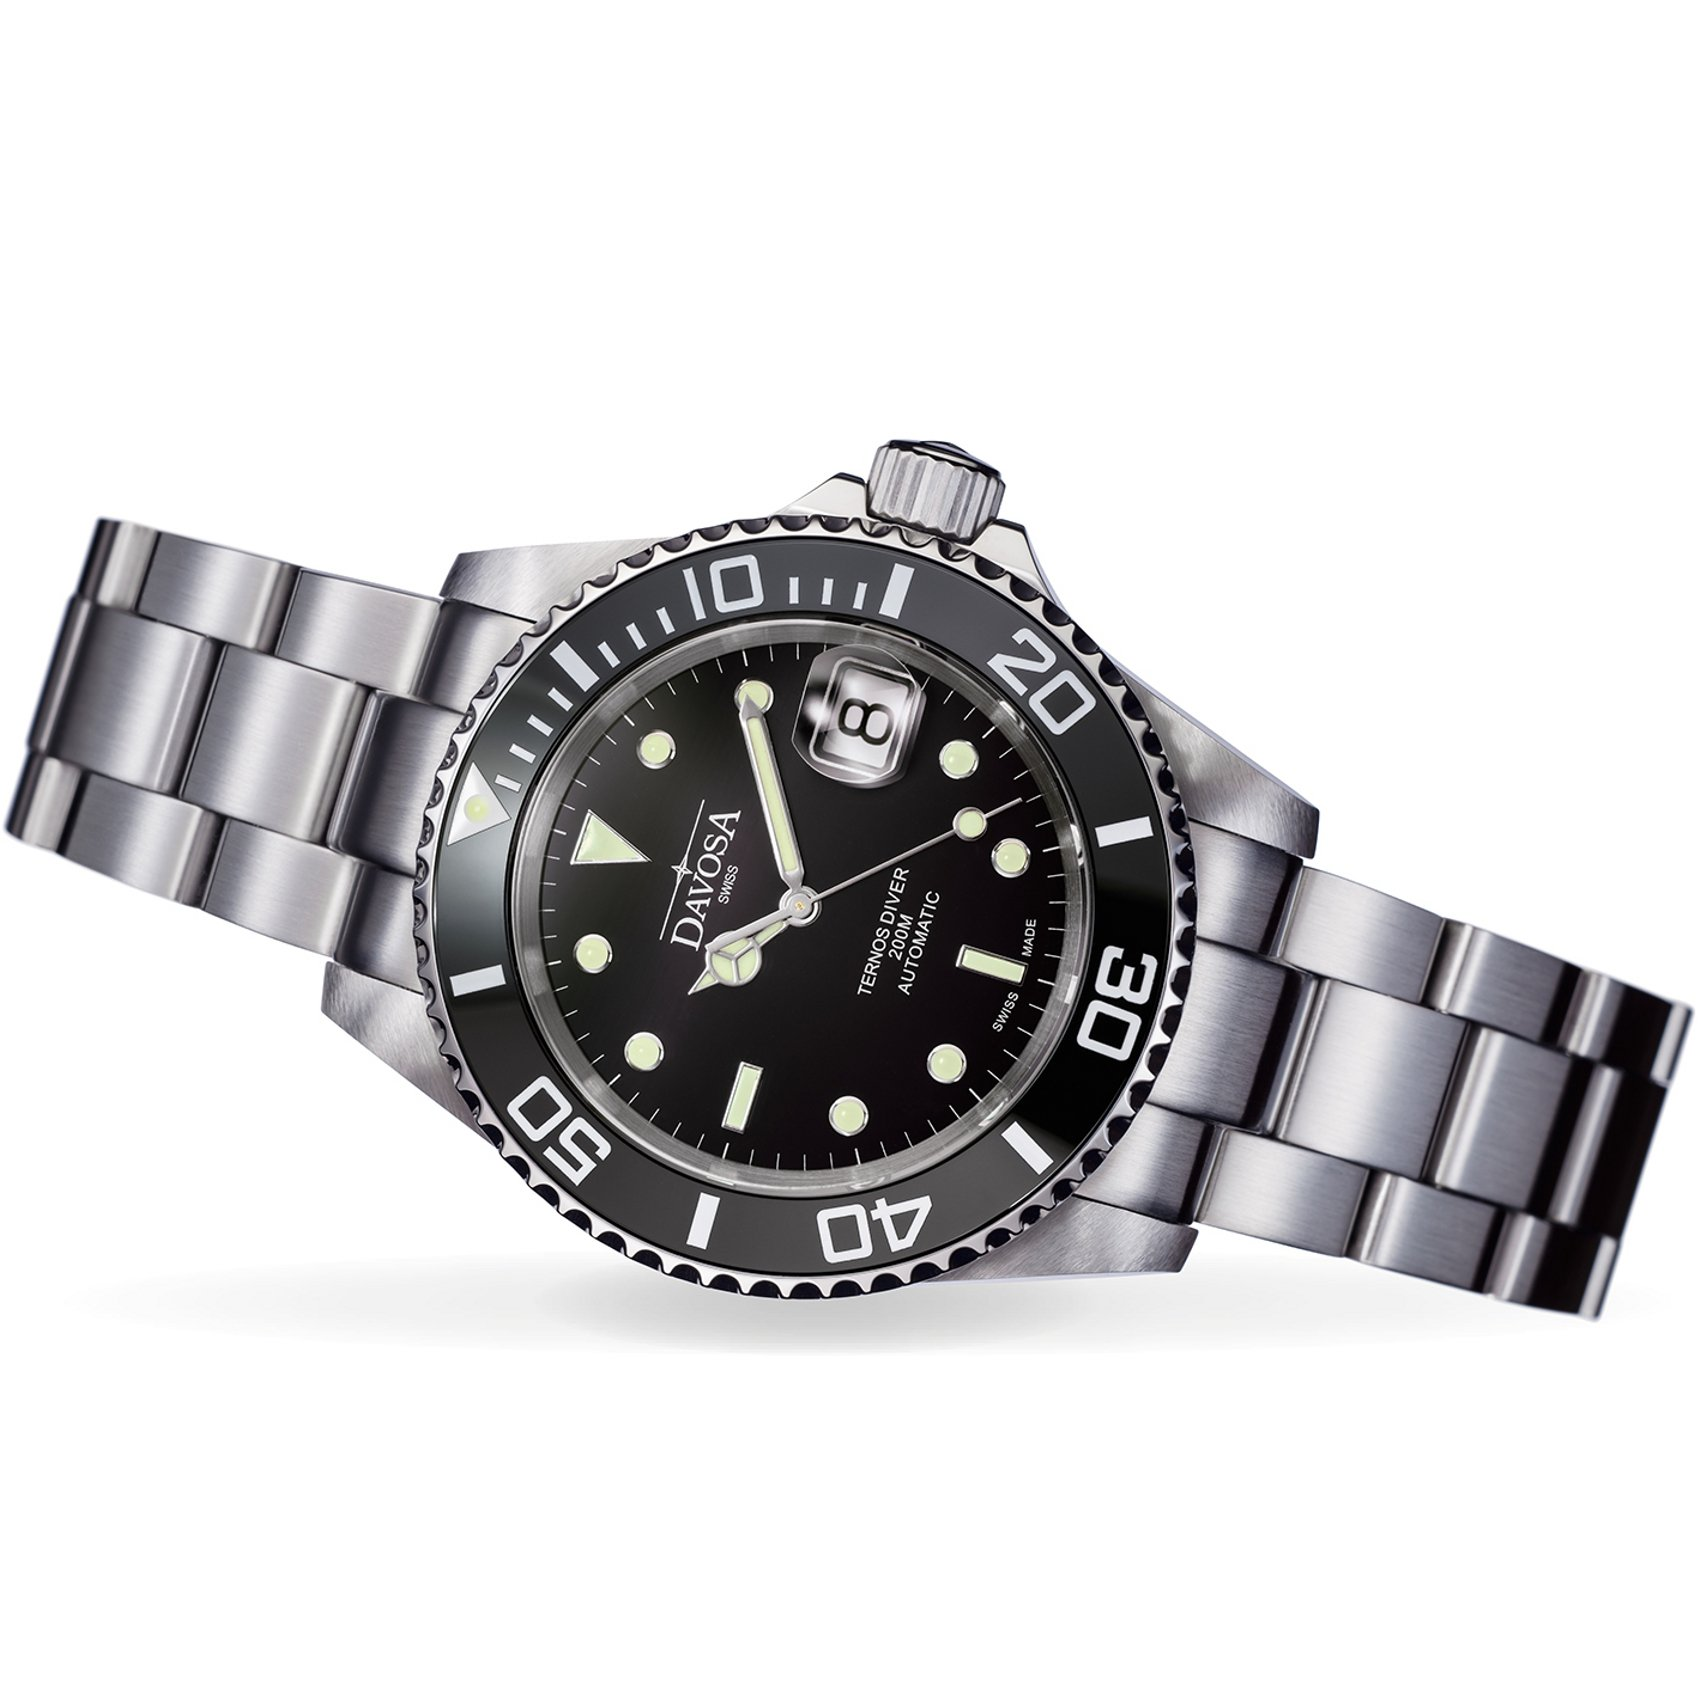 Davosa Swiss Made Men Wrist Watch, Ternos Ceramic 16155550 Professional Automatic Analog Display & Luxury Bezel by Davosa (Image #3)